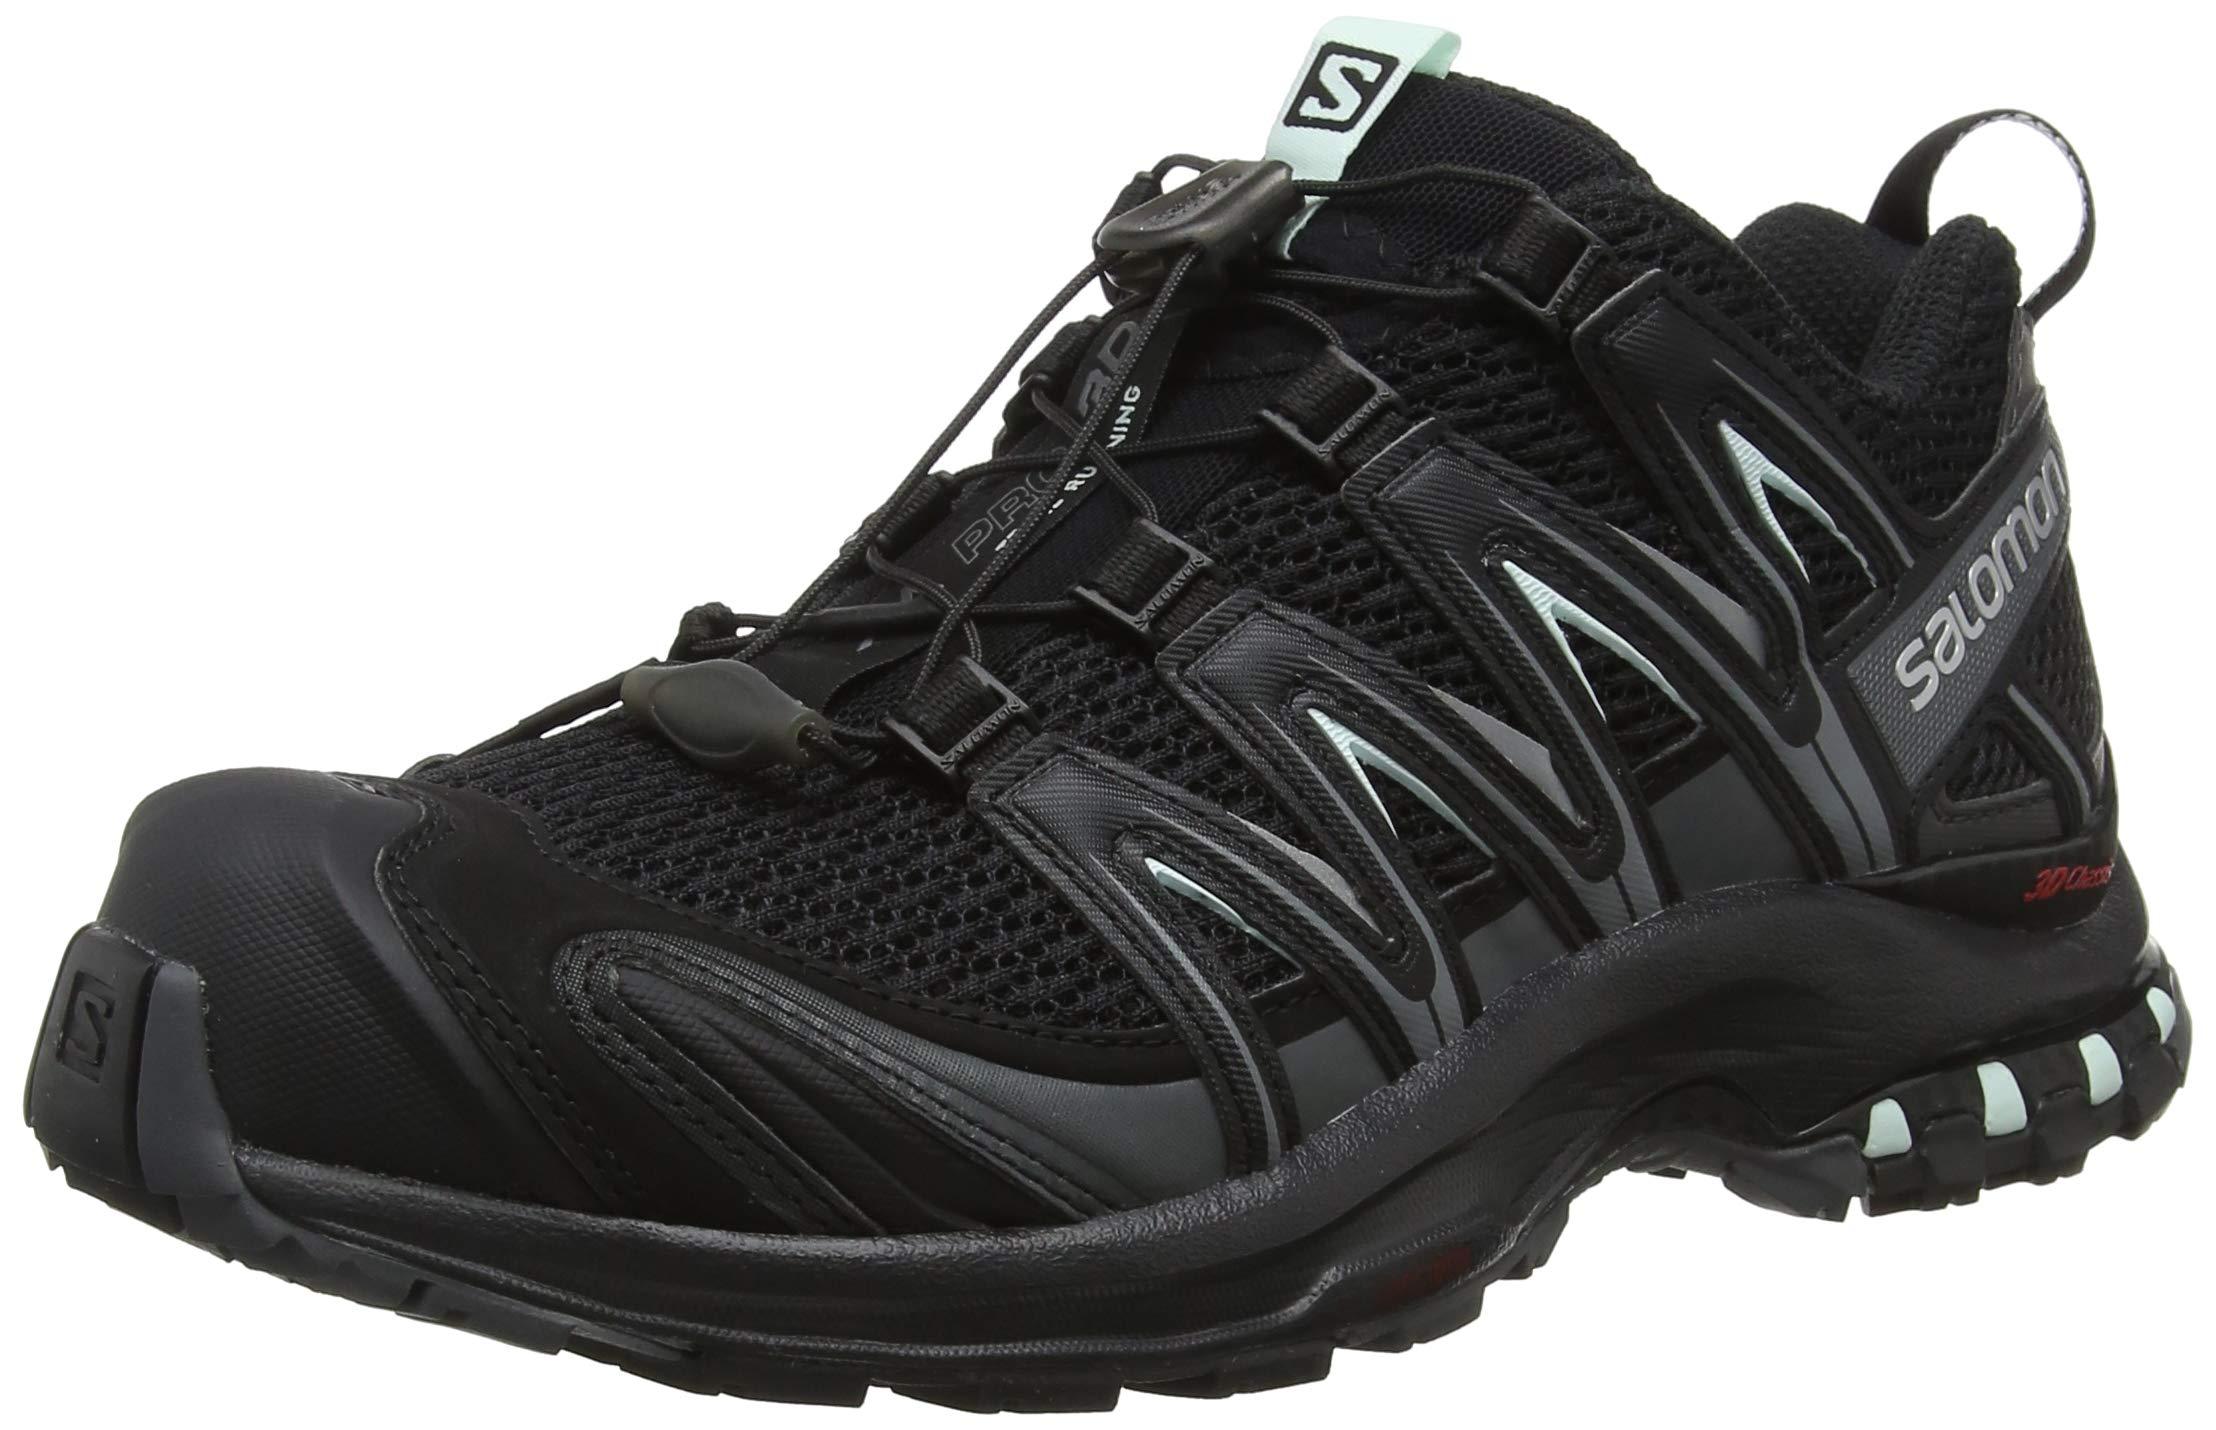 Salomon Women's XA PRO 3D W Trail Runner, Black, 5 M US